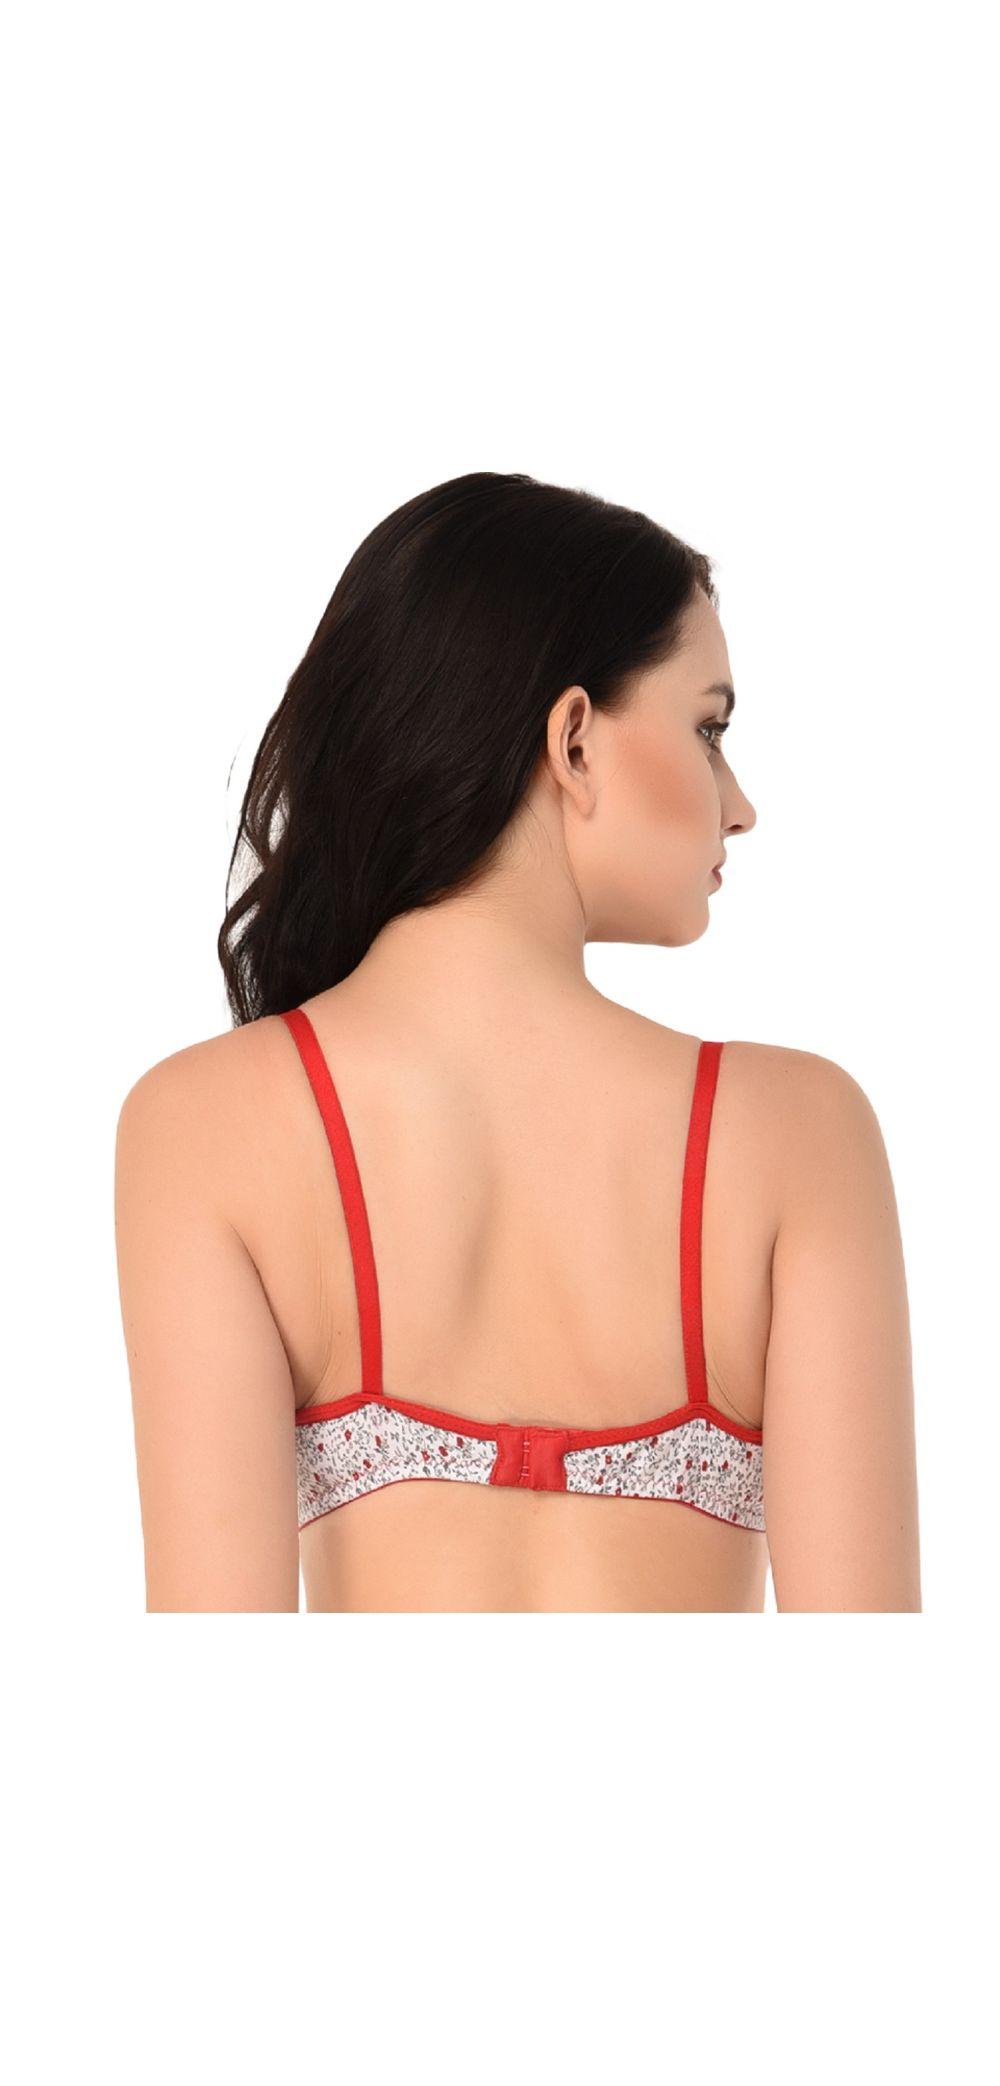 c9a66ab839dfe Glus Printed Soft Skin Padded Non-Wired T-Shirt Bra